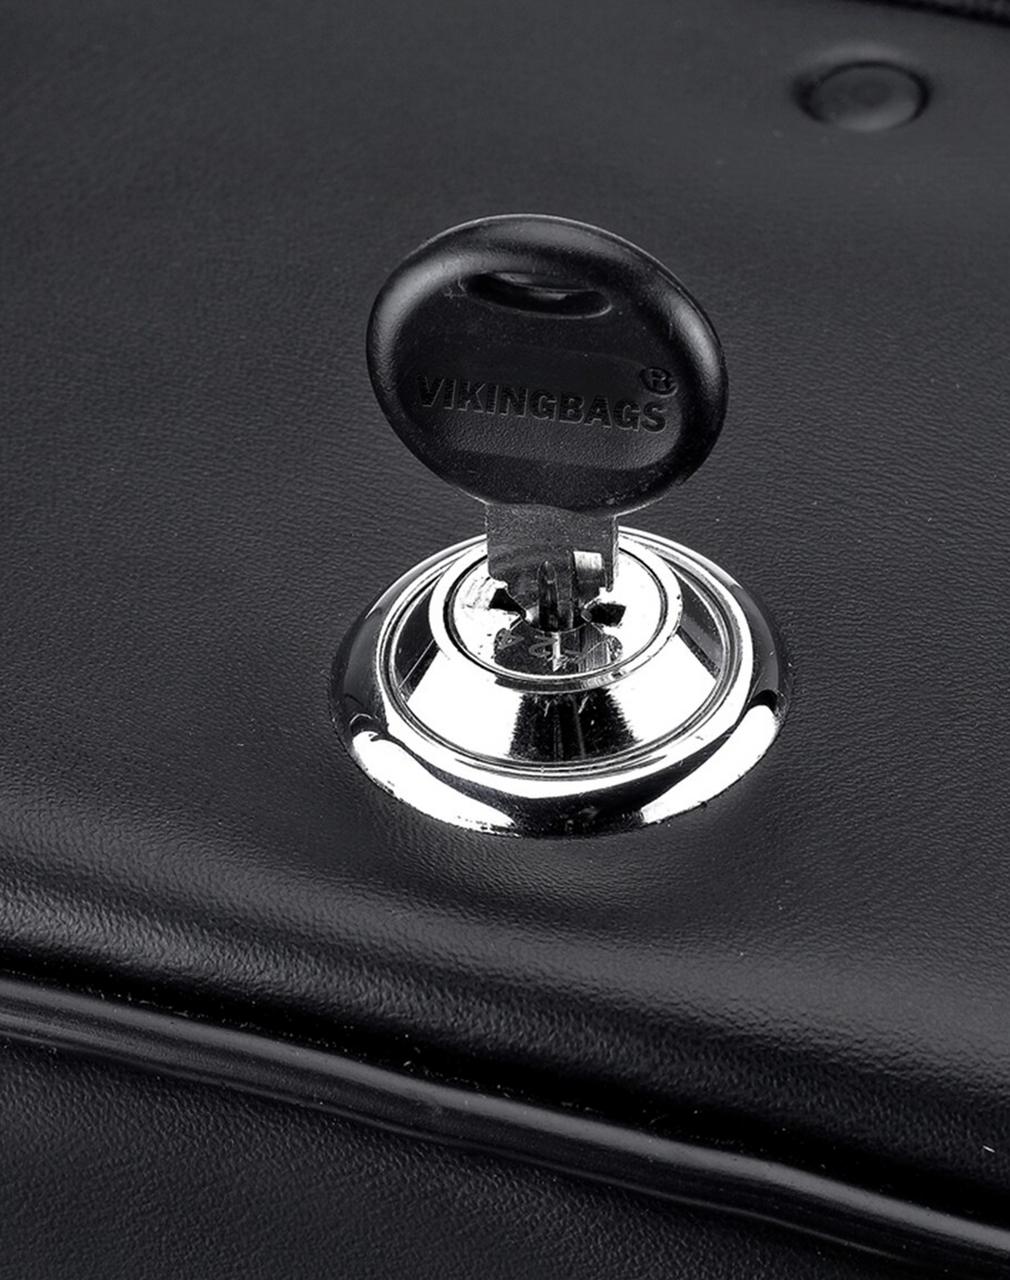 Triumph Rocket III Range Charger Single Strap Medium Motorcycle Saddlebags Key Lock View